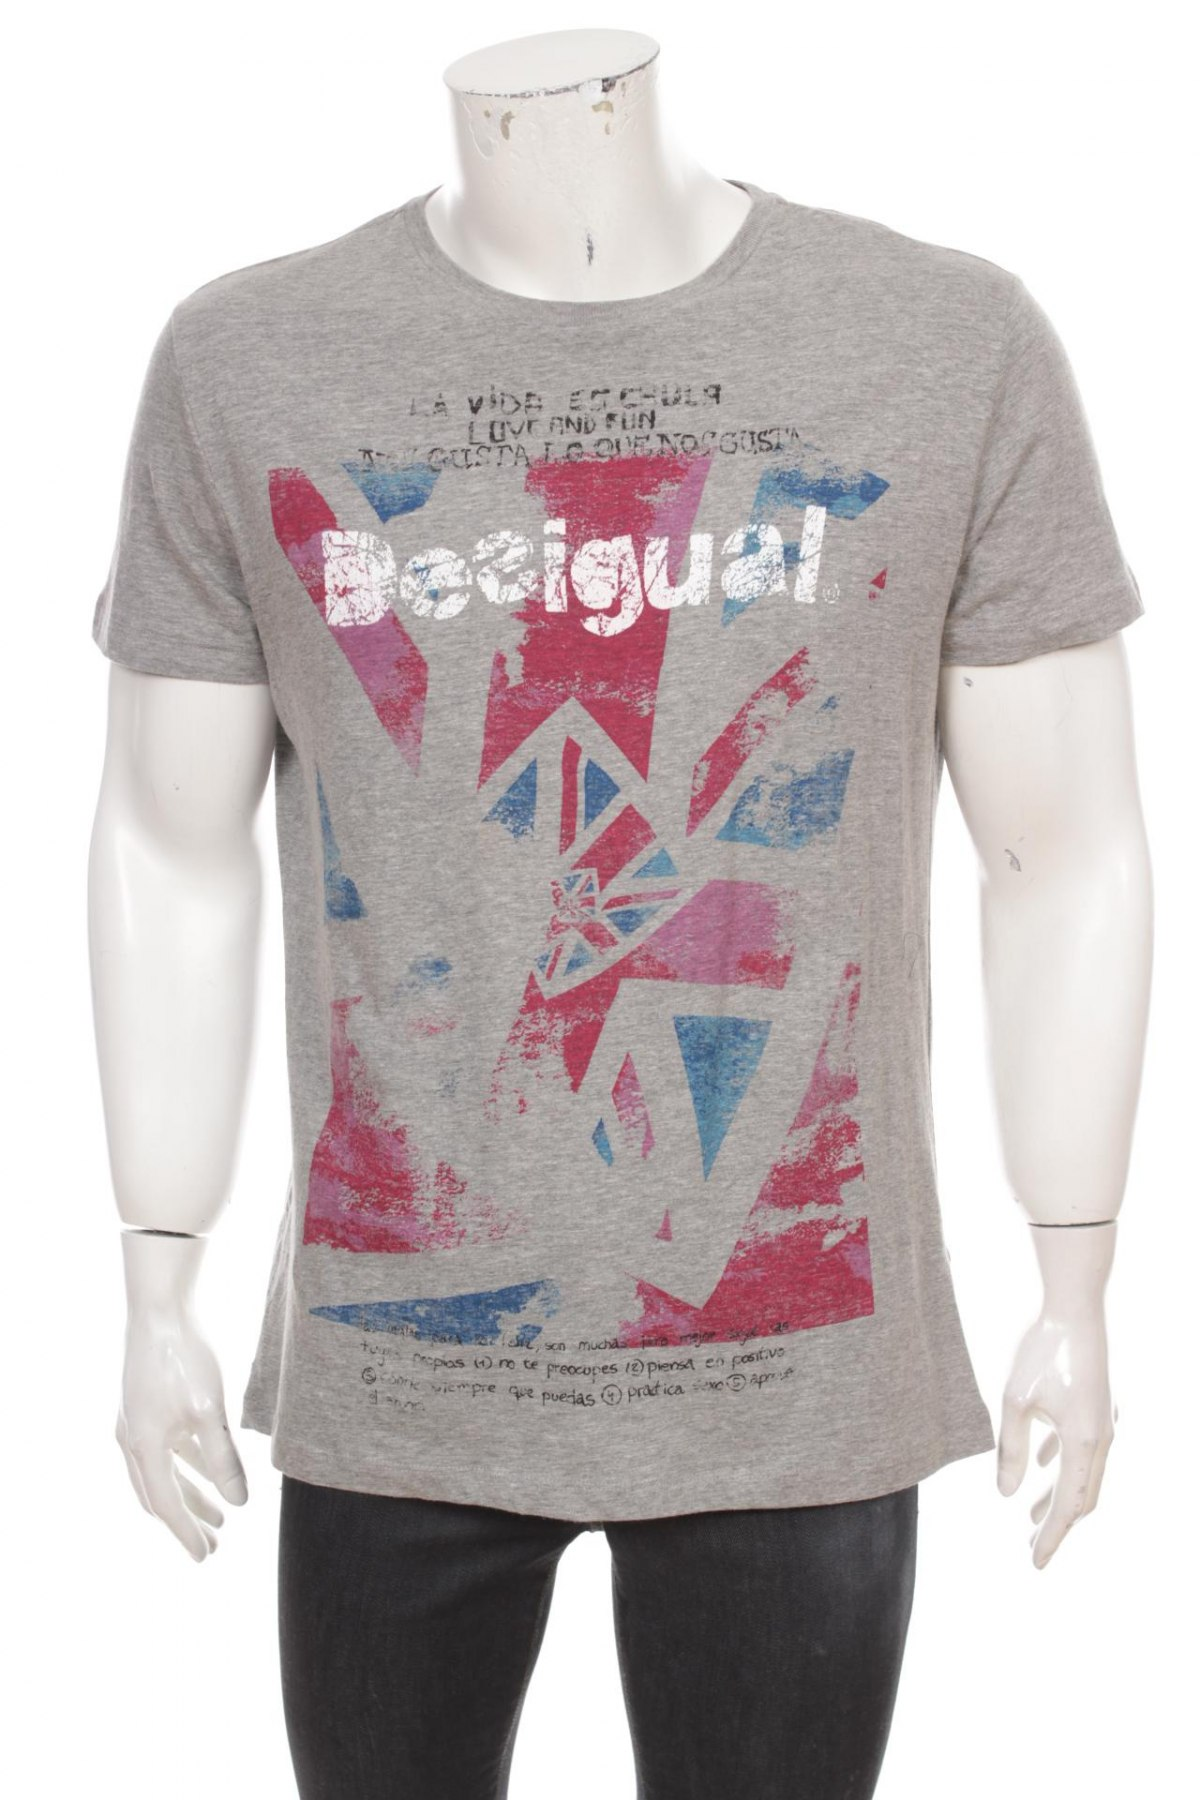 Pánske tričko Desigual - za výhodnú cenu na Remix -  100343502 16c03ad2247